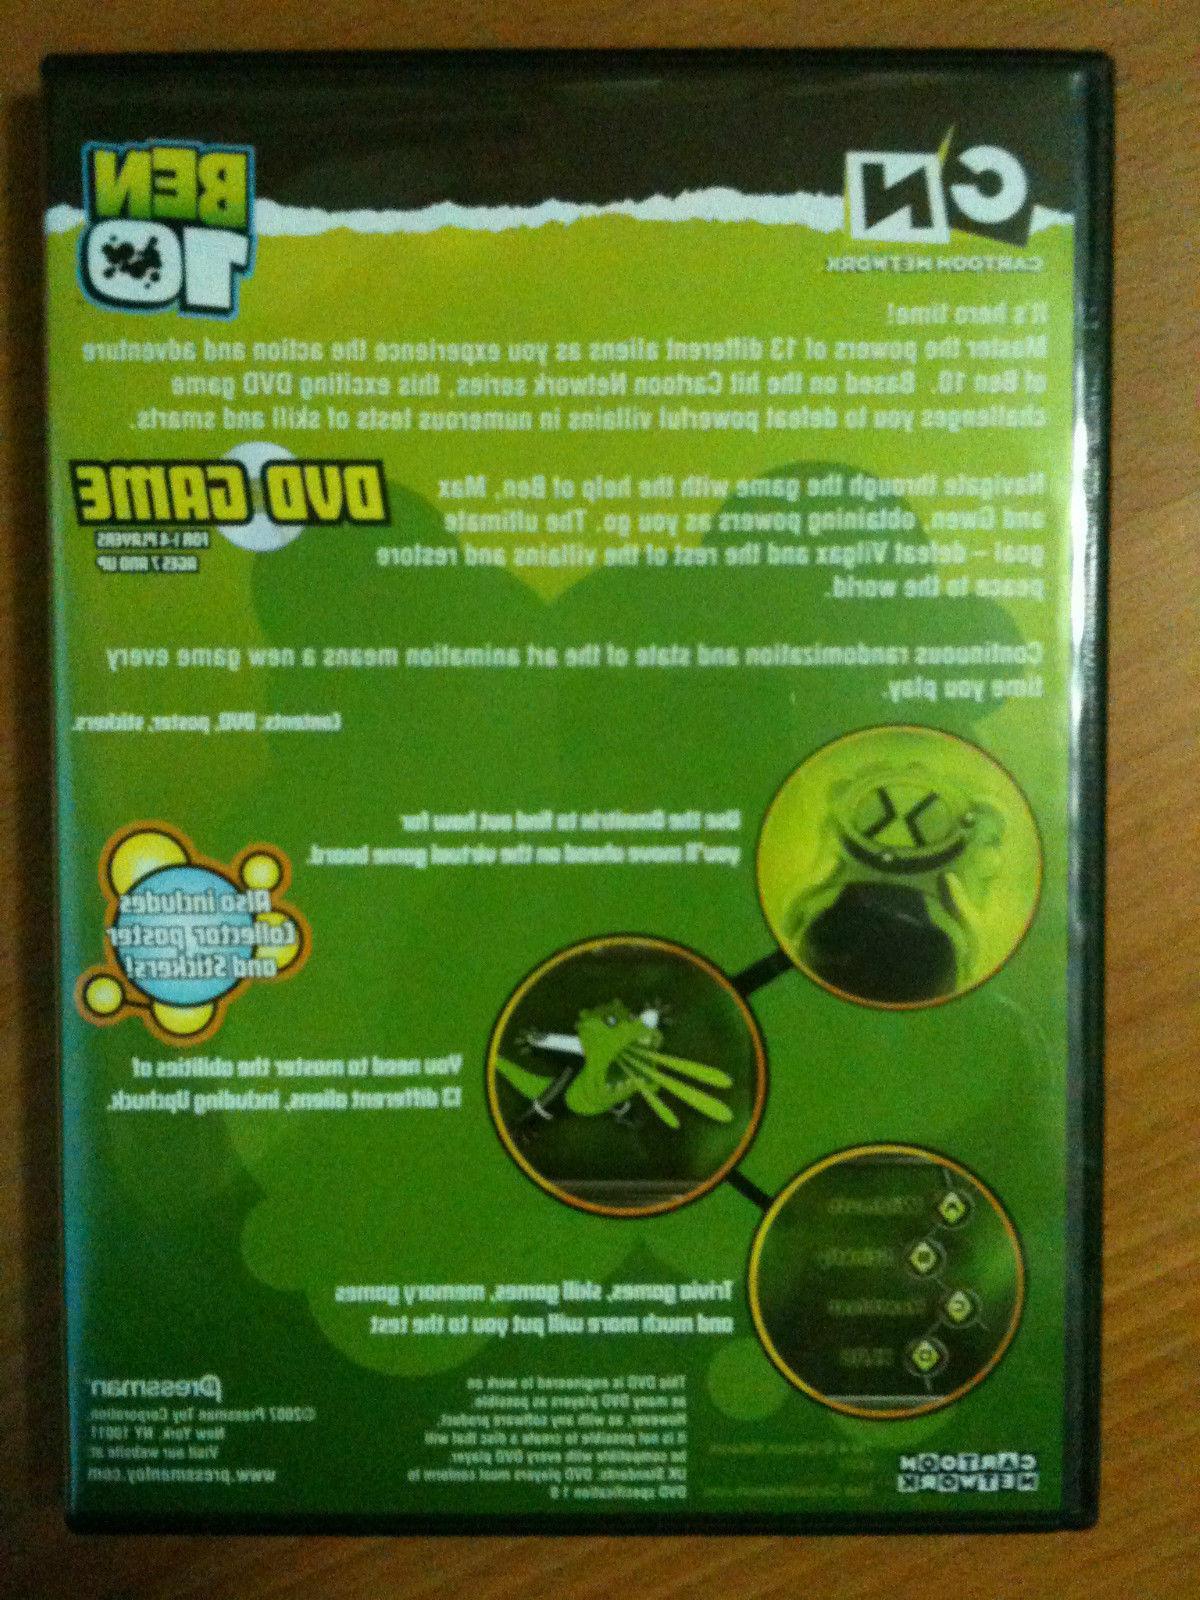 Ben Dvd 1-4 players Kids Family Game